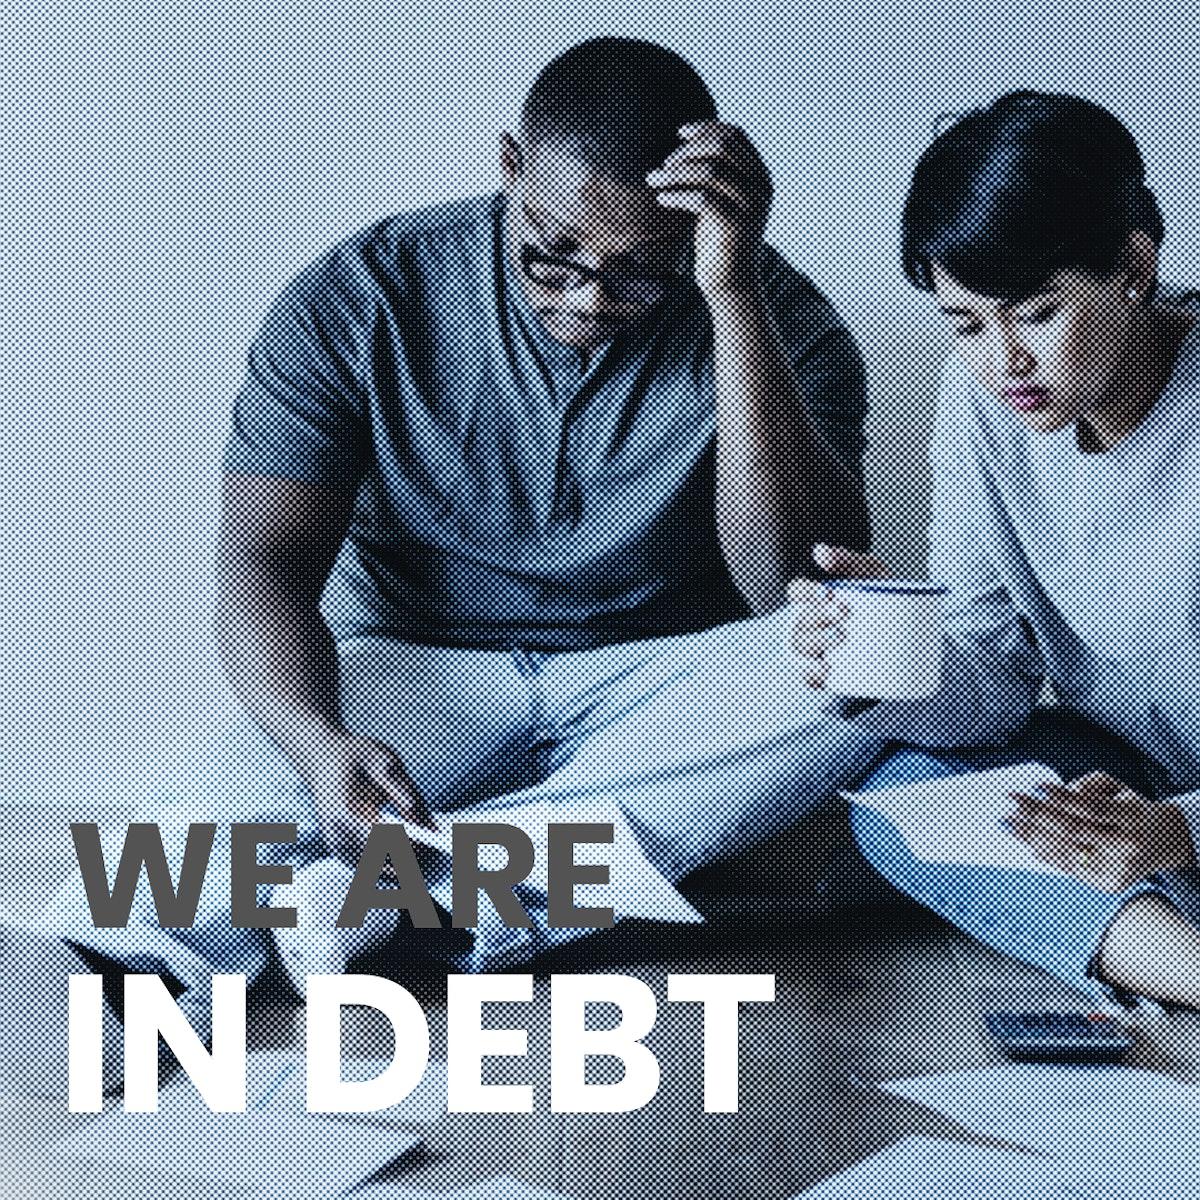 Couple managing the debt during coronavirus pandemic mockup